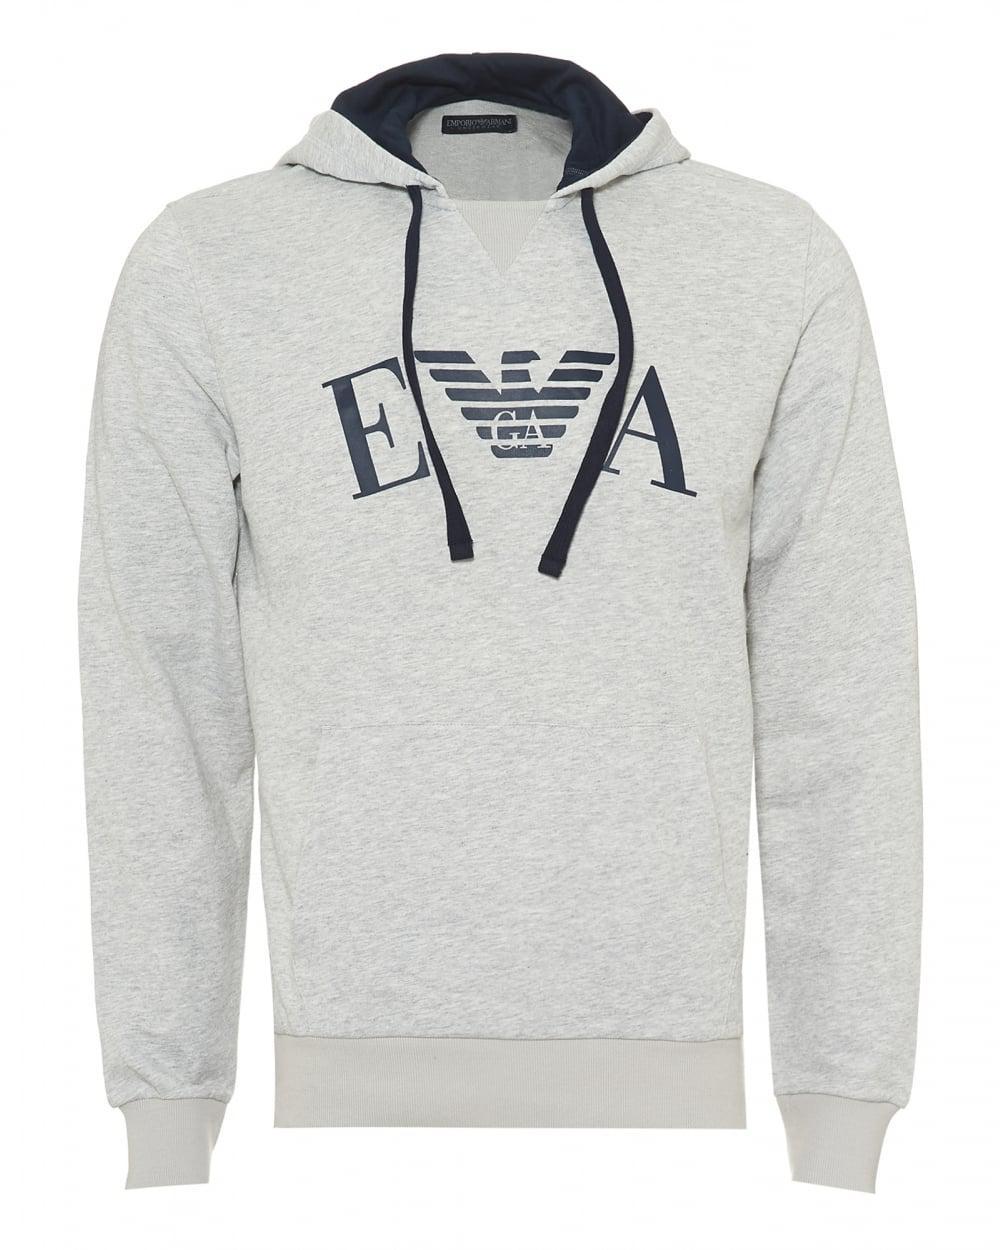 6c1cc5c3 Emporio Armani Overhead Hoodie, Ea Logo Front Grey Sweat in Gray for ...